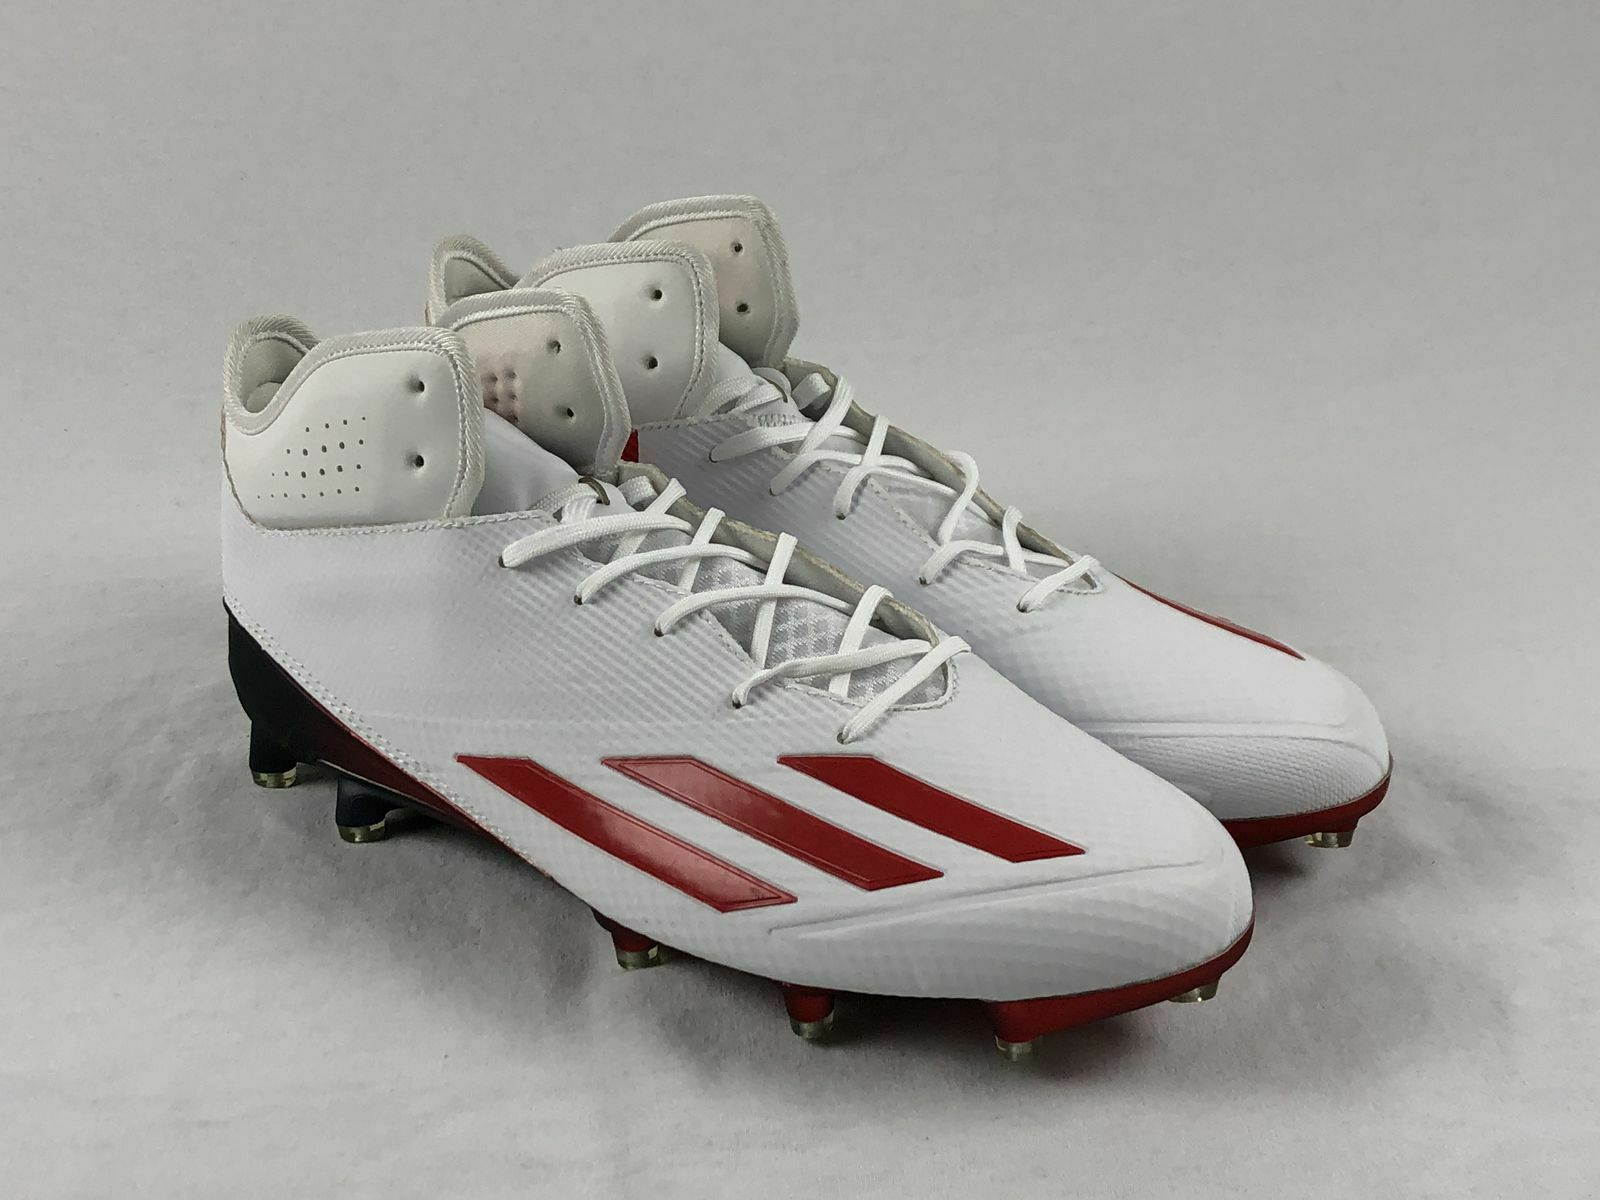 NEW adidas Adizero Mid - White Red Cleats (Men's 13)